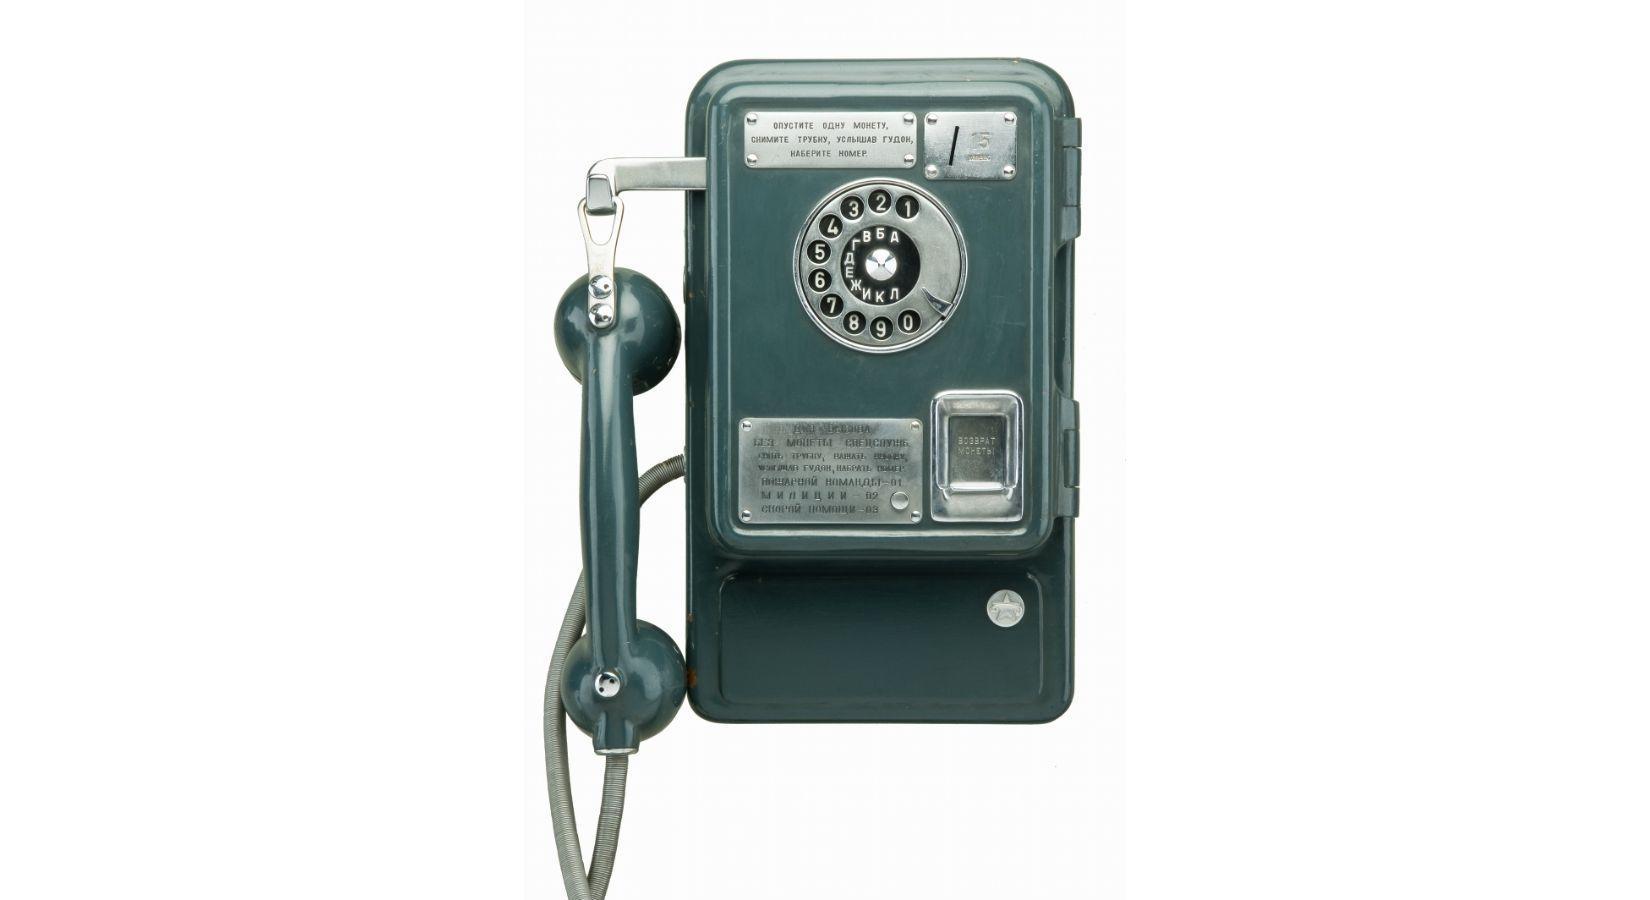 металлический телефон